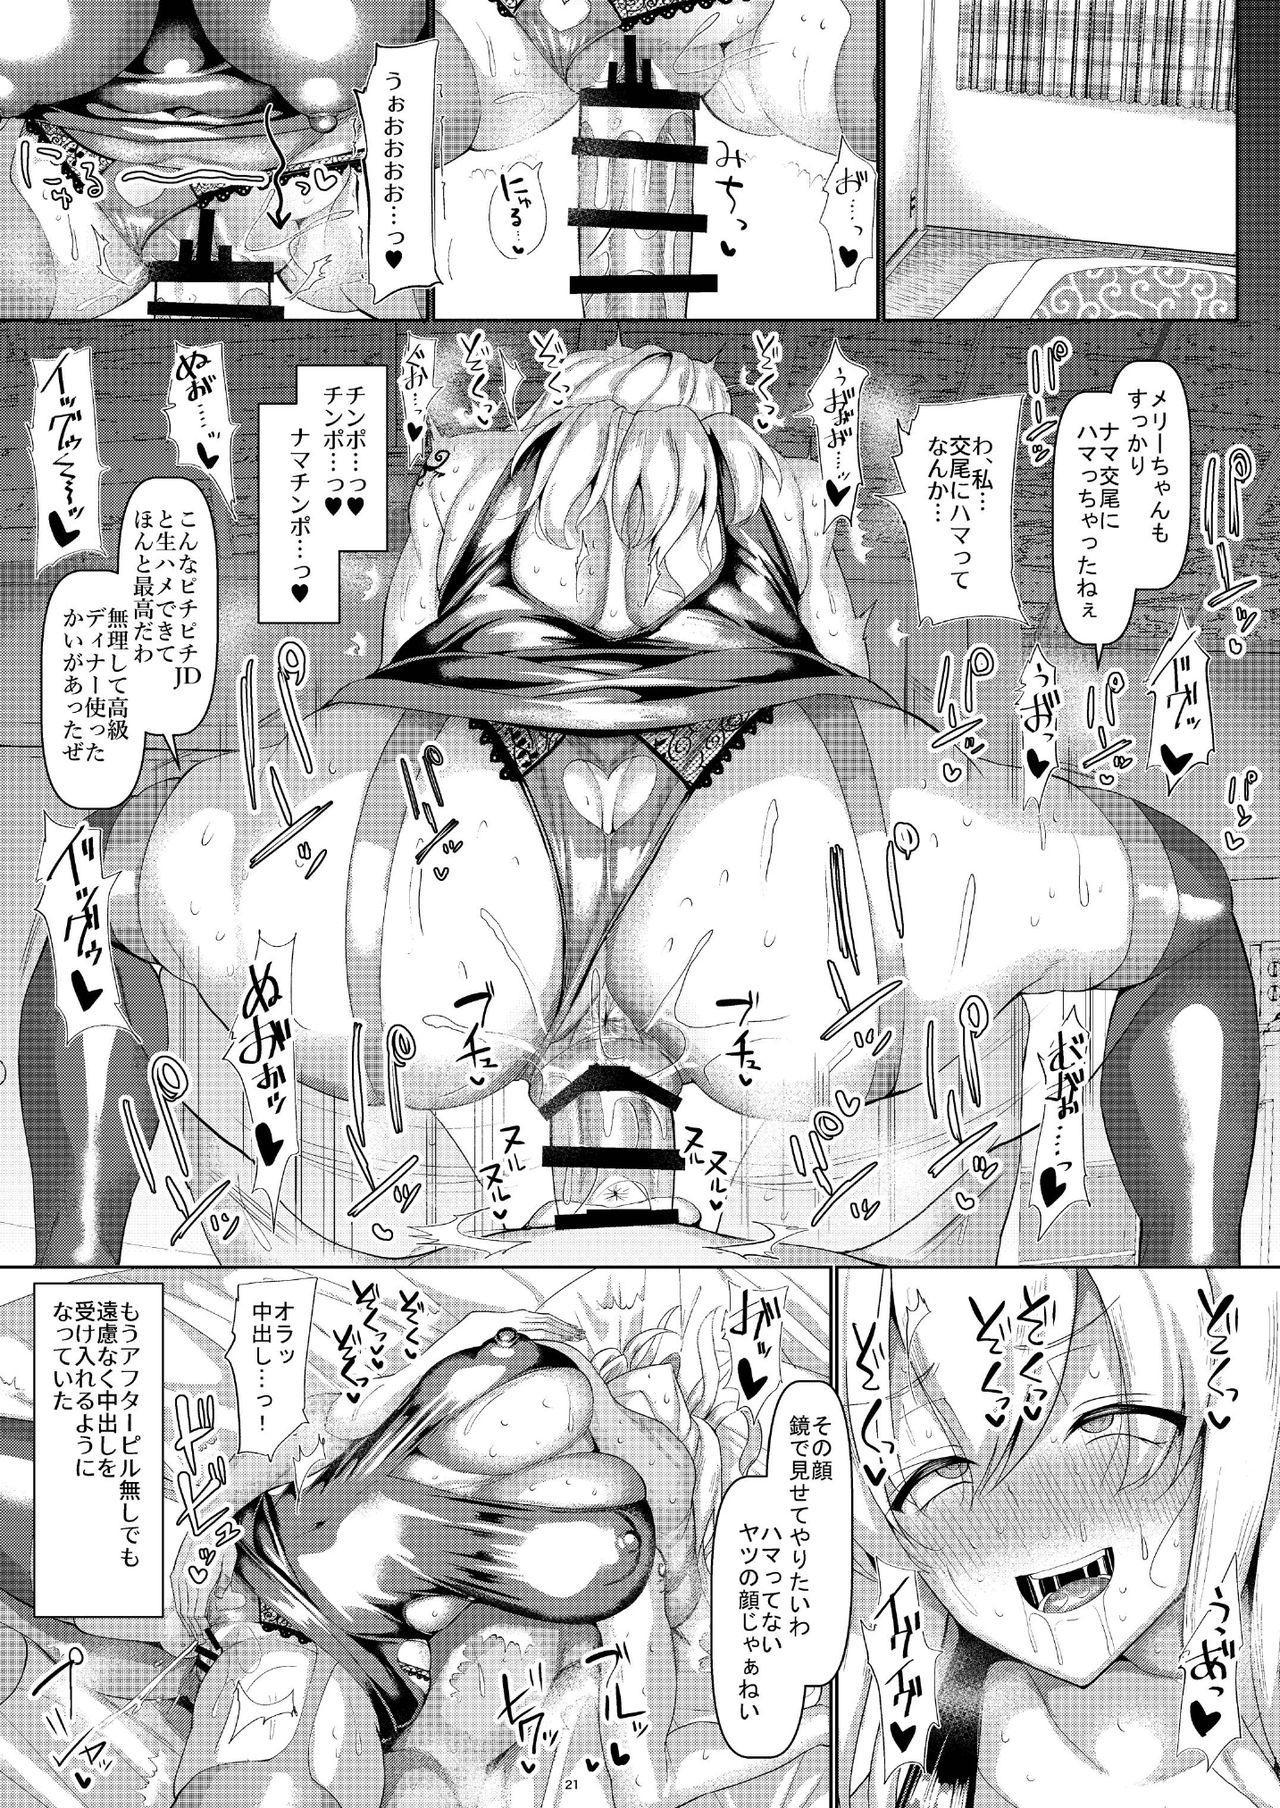 BodyCon Merry no Ogehin Koubi 22